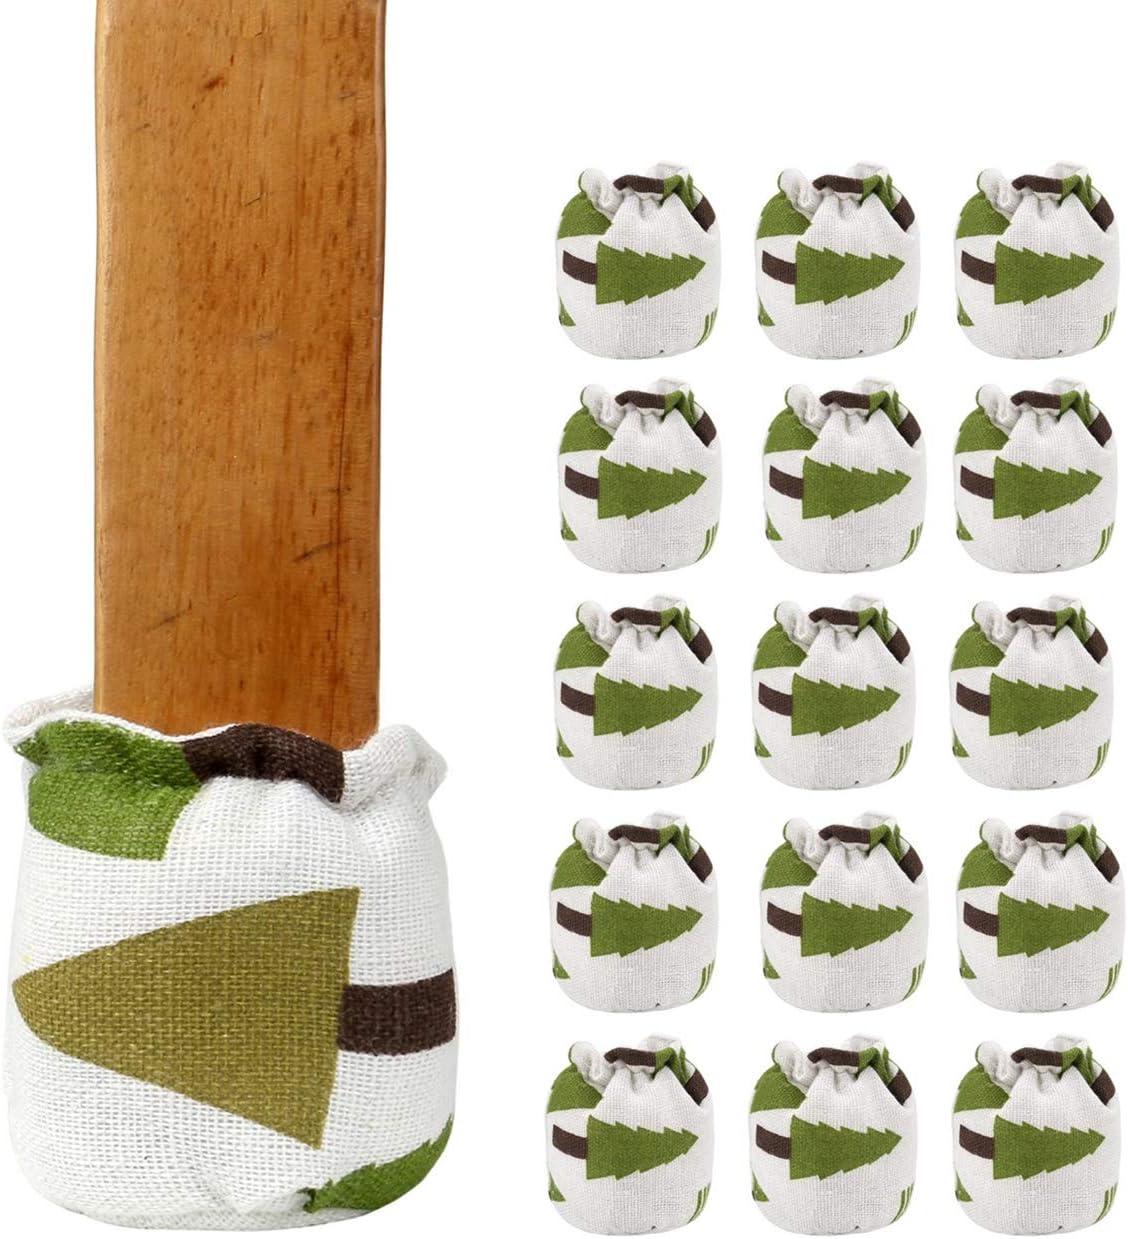 Yoption 16Pcs Chair Leg Socks Linen Bargain Regular discount Tree Cotton Christmas Table